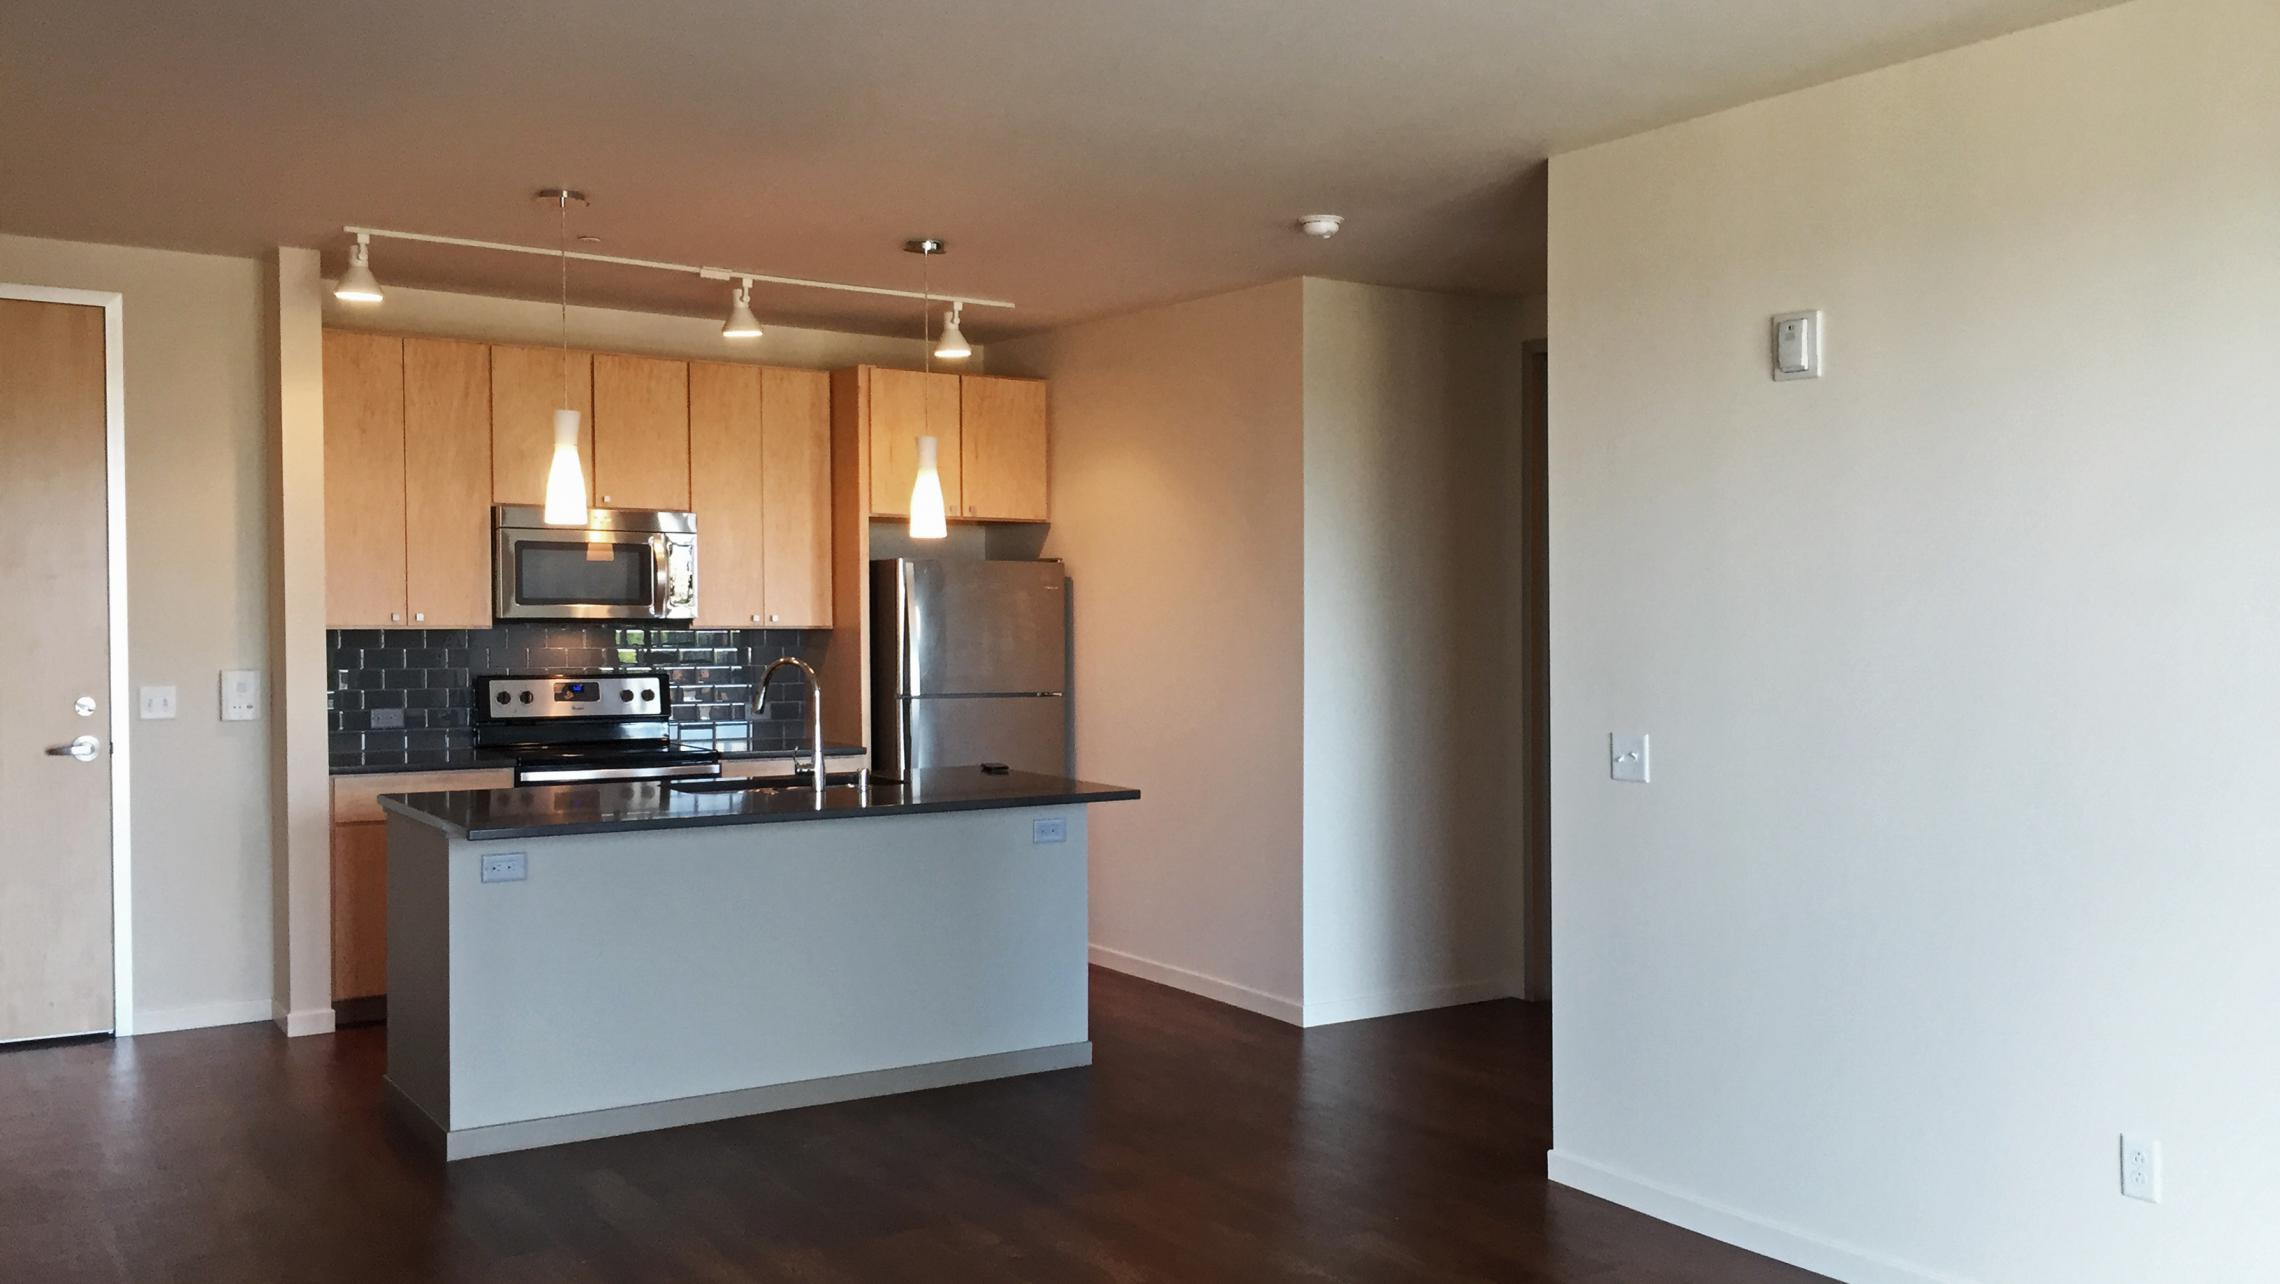 ULI Nine Line Apartment 319 - Kitchen and Living Area